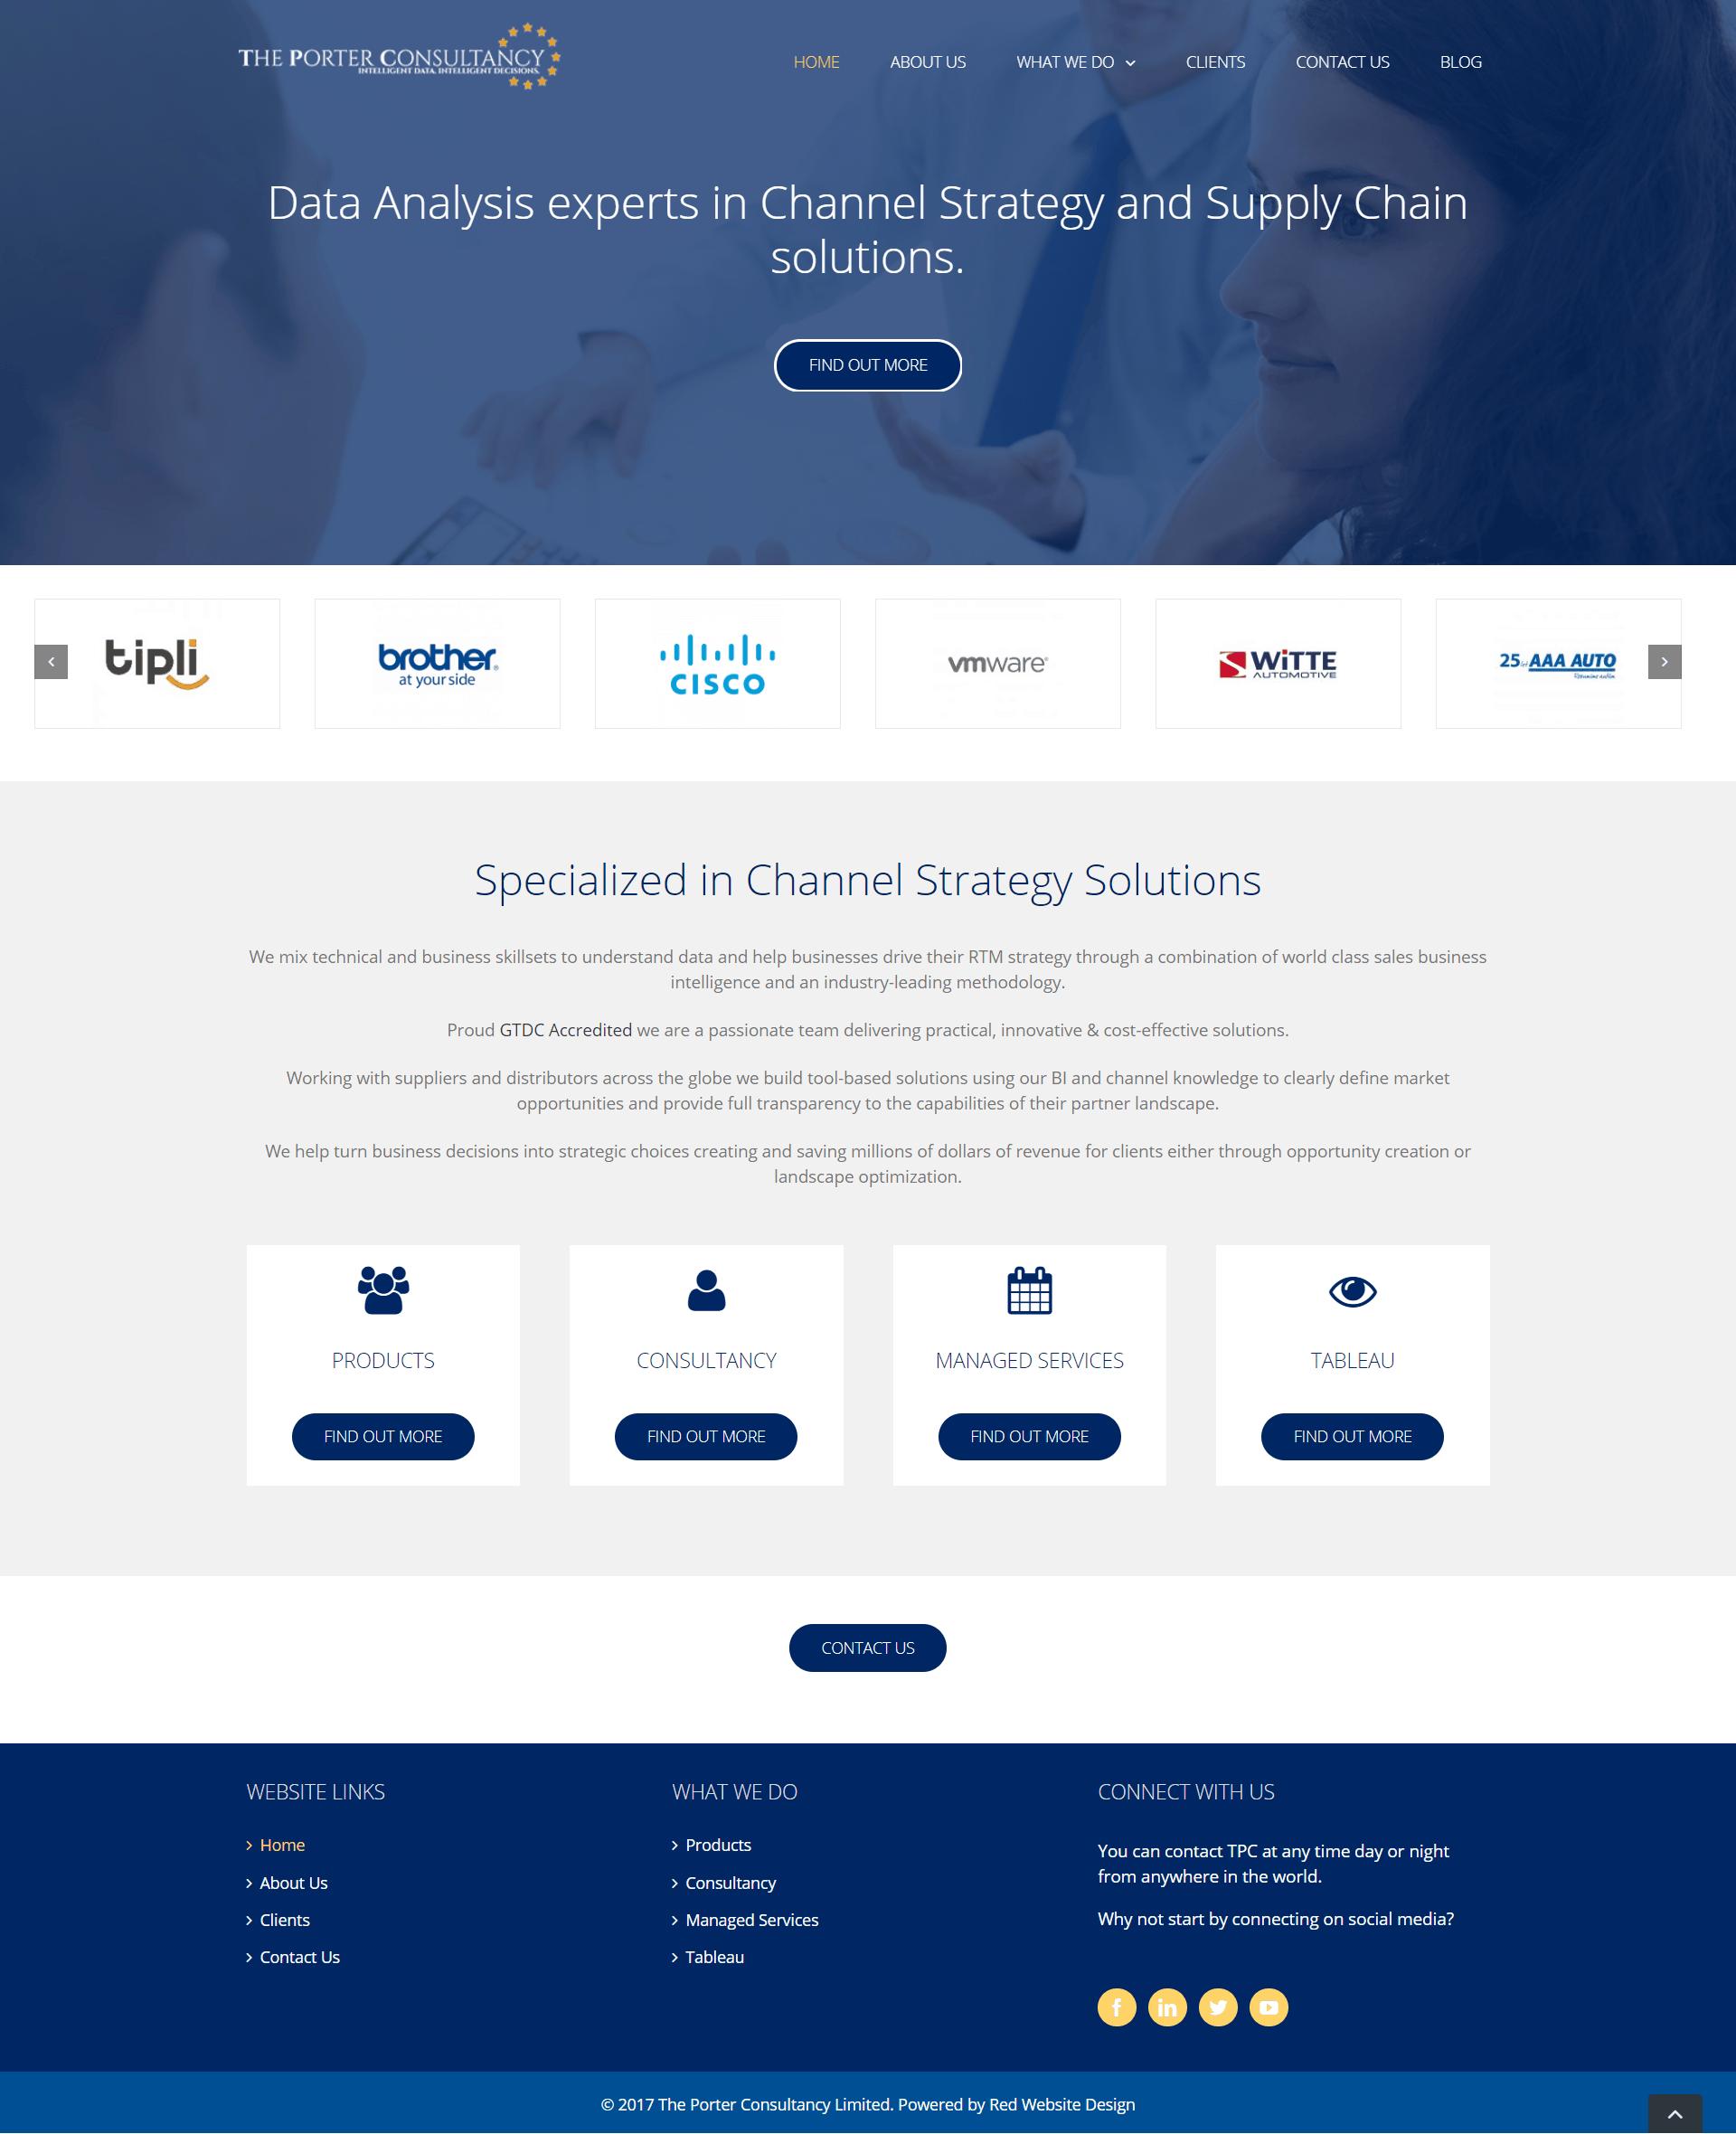 Web Design Prague